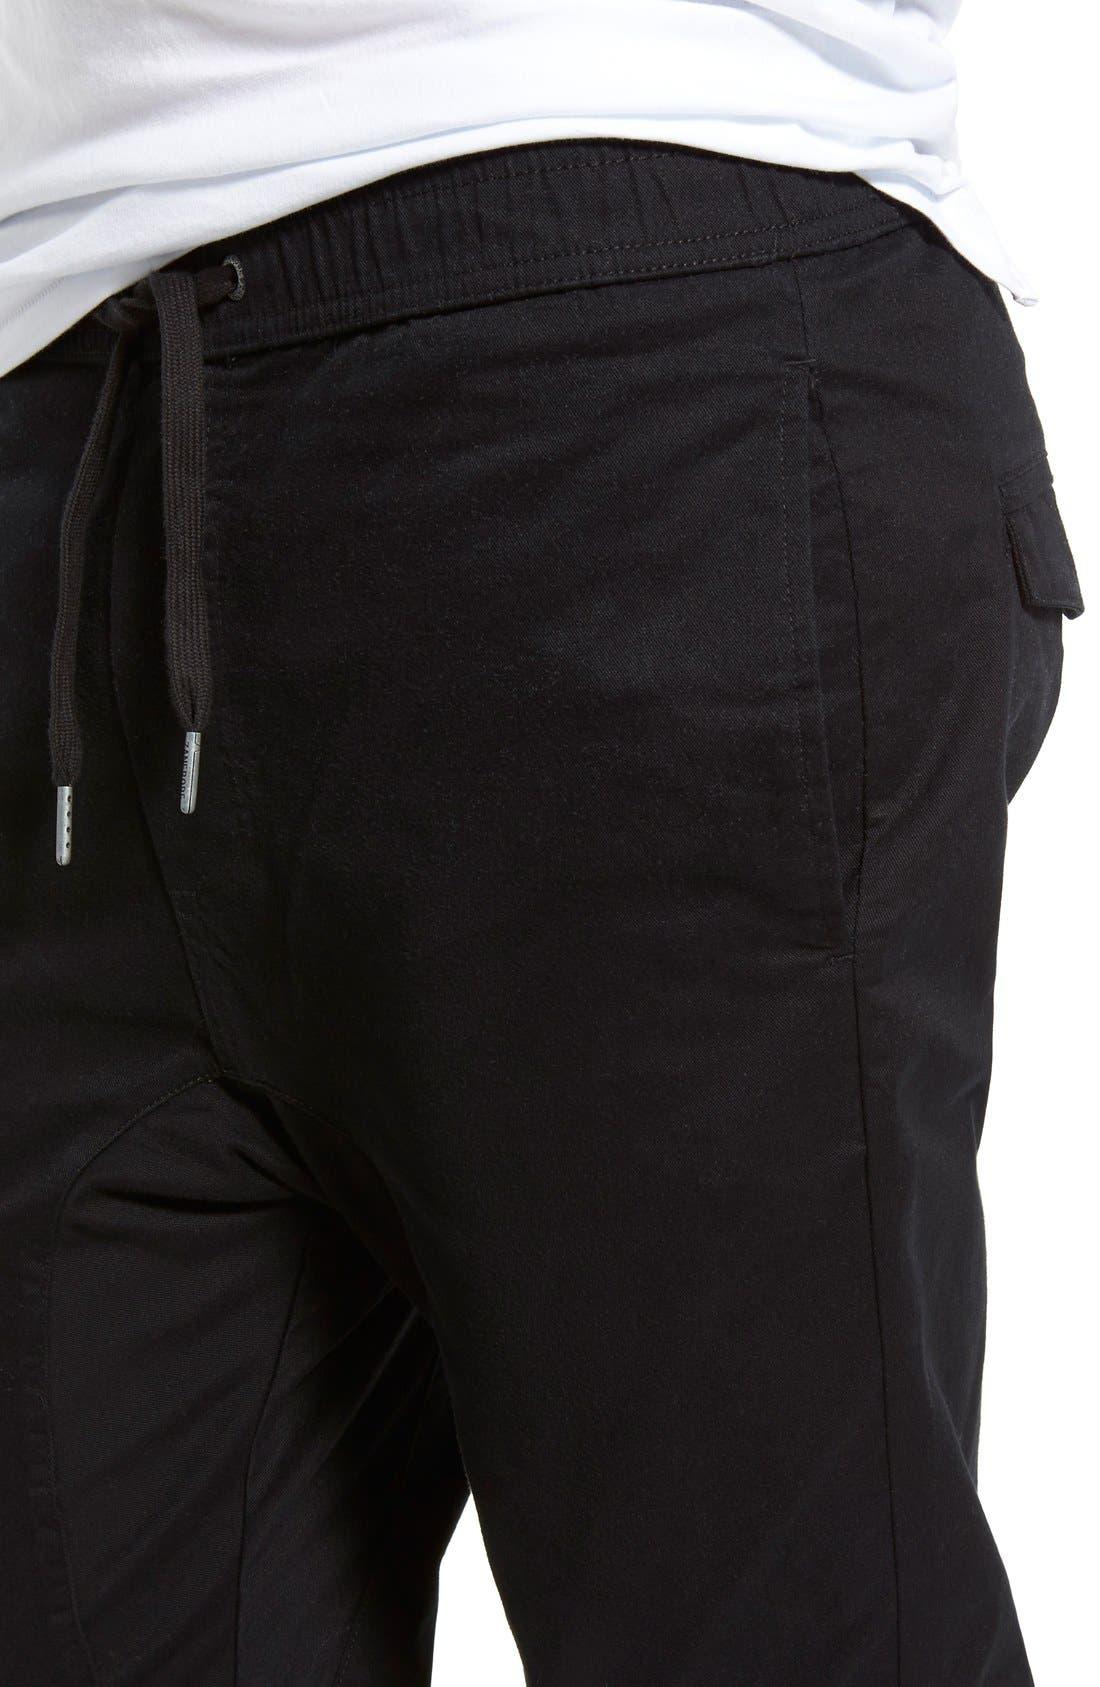 ZANEROBE, Salerno Stretch Woven Jogger Pants, Alternate thumbnail 4, color, BLACK